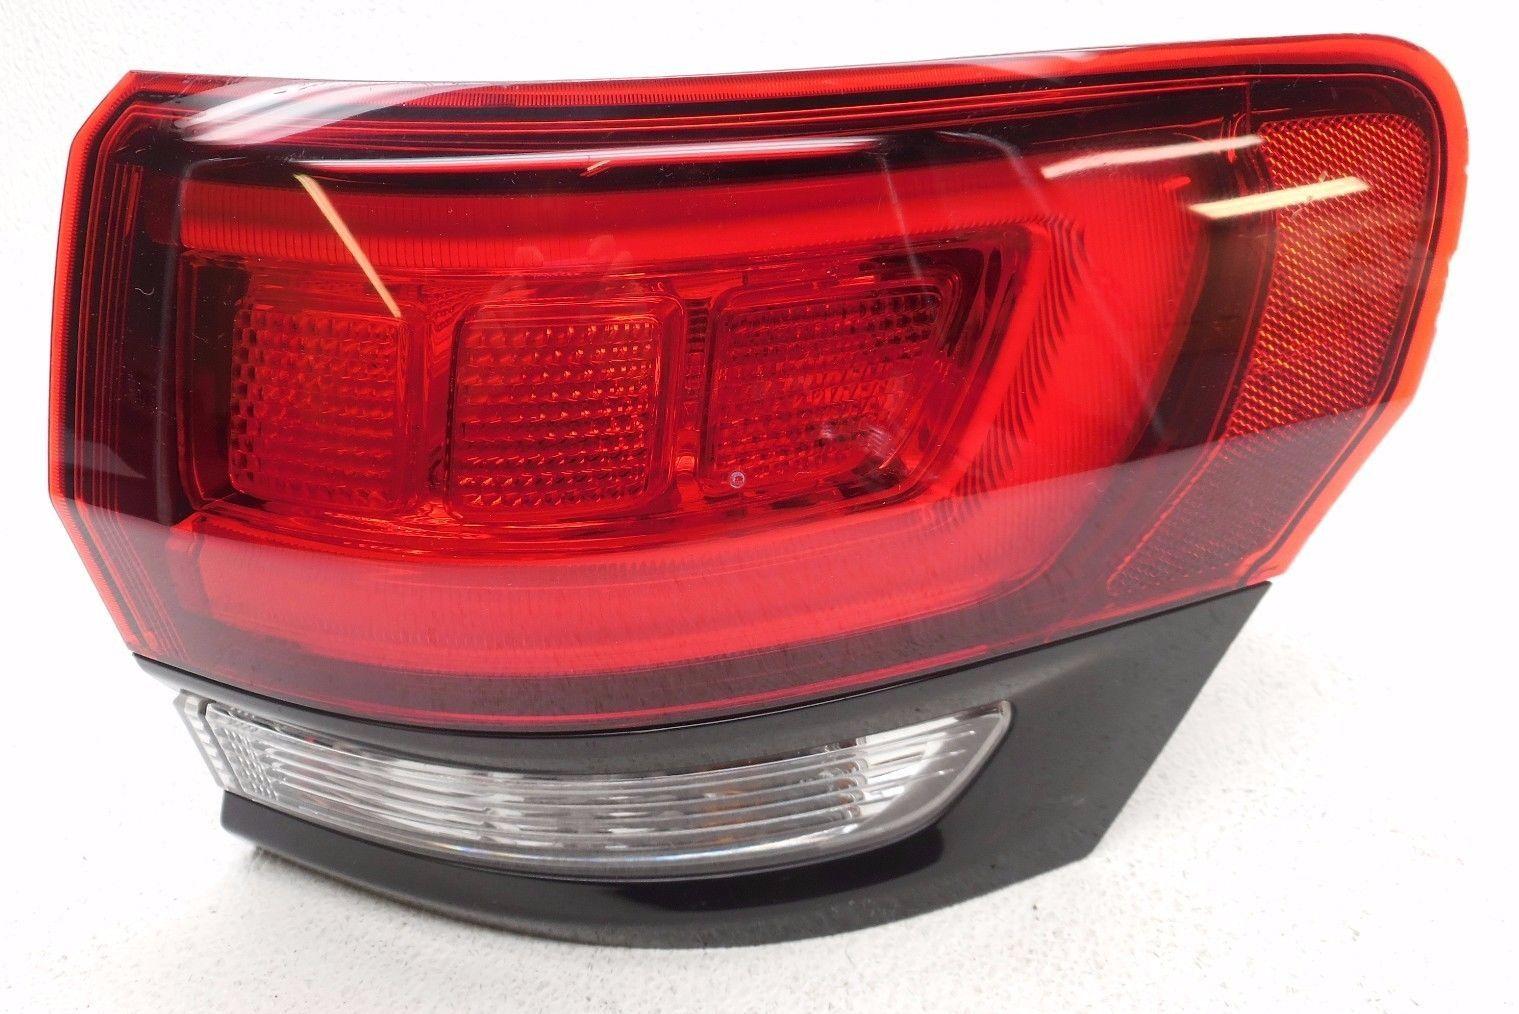 15 jeep grand cherokee srt8 right led tail light tail lamp visual. Black Bedroom Furniture Sets. Home Design Ideas